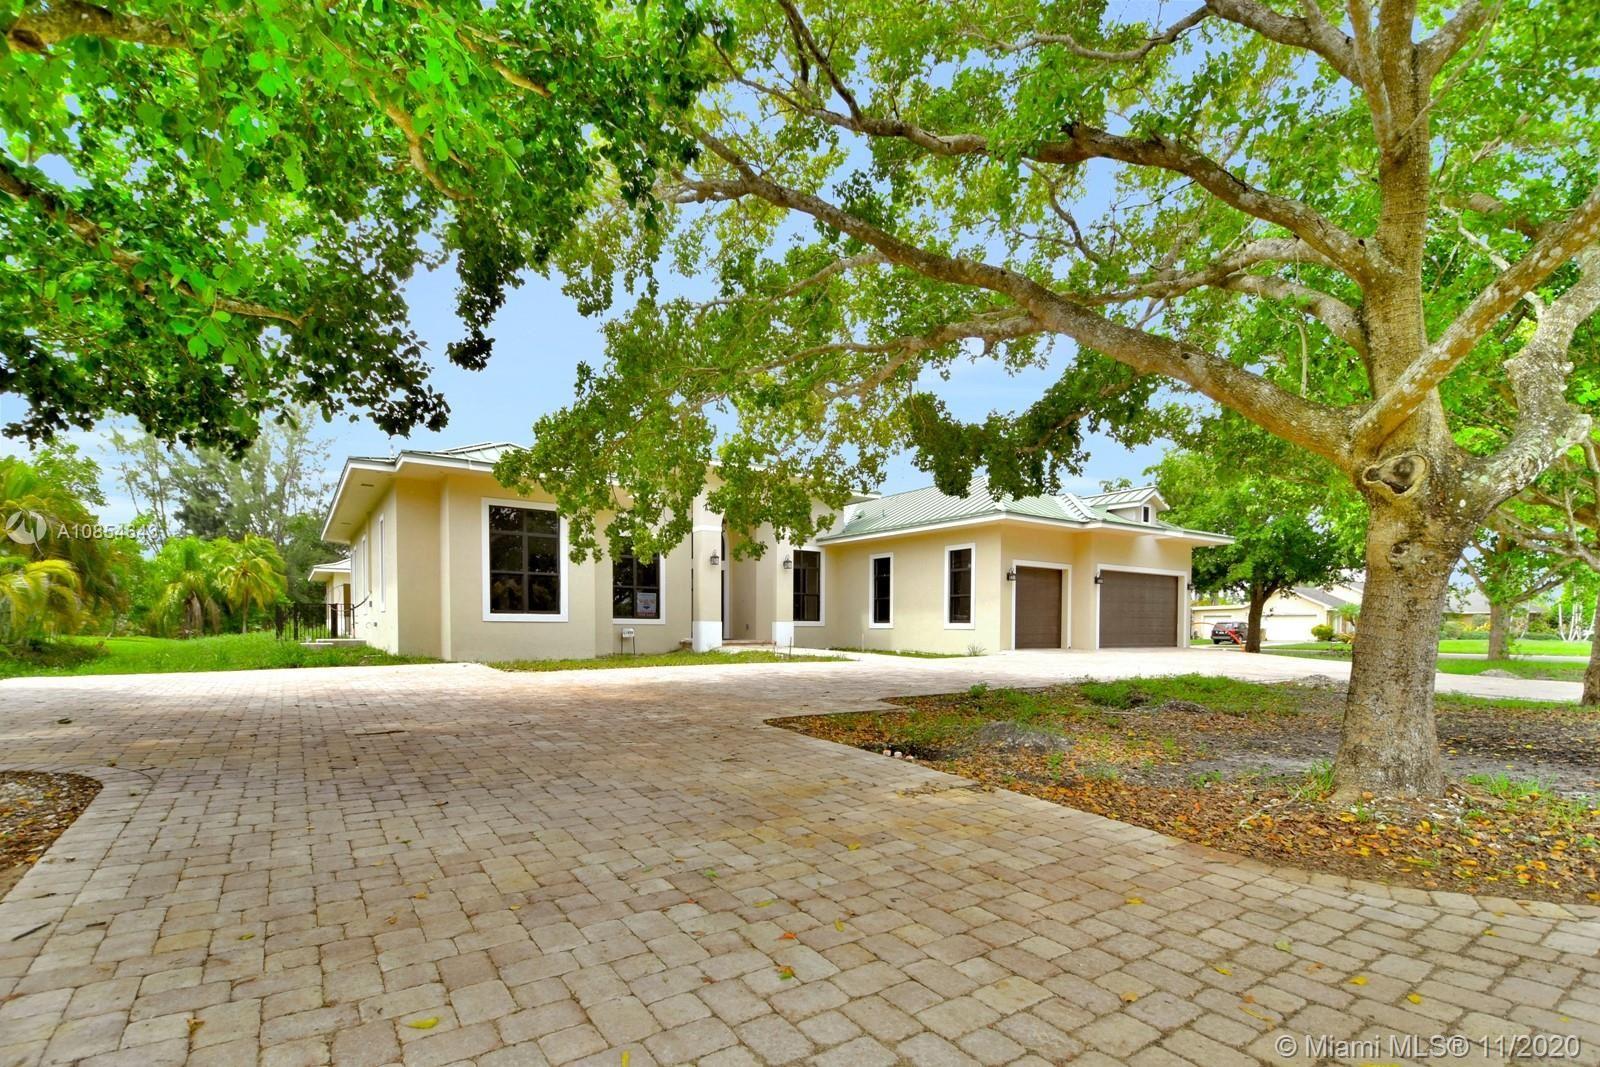 11870 Acorn Drive, Davie, FL 33330 - #: A10854643